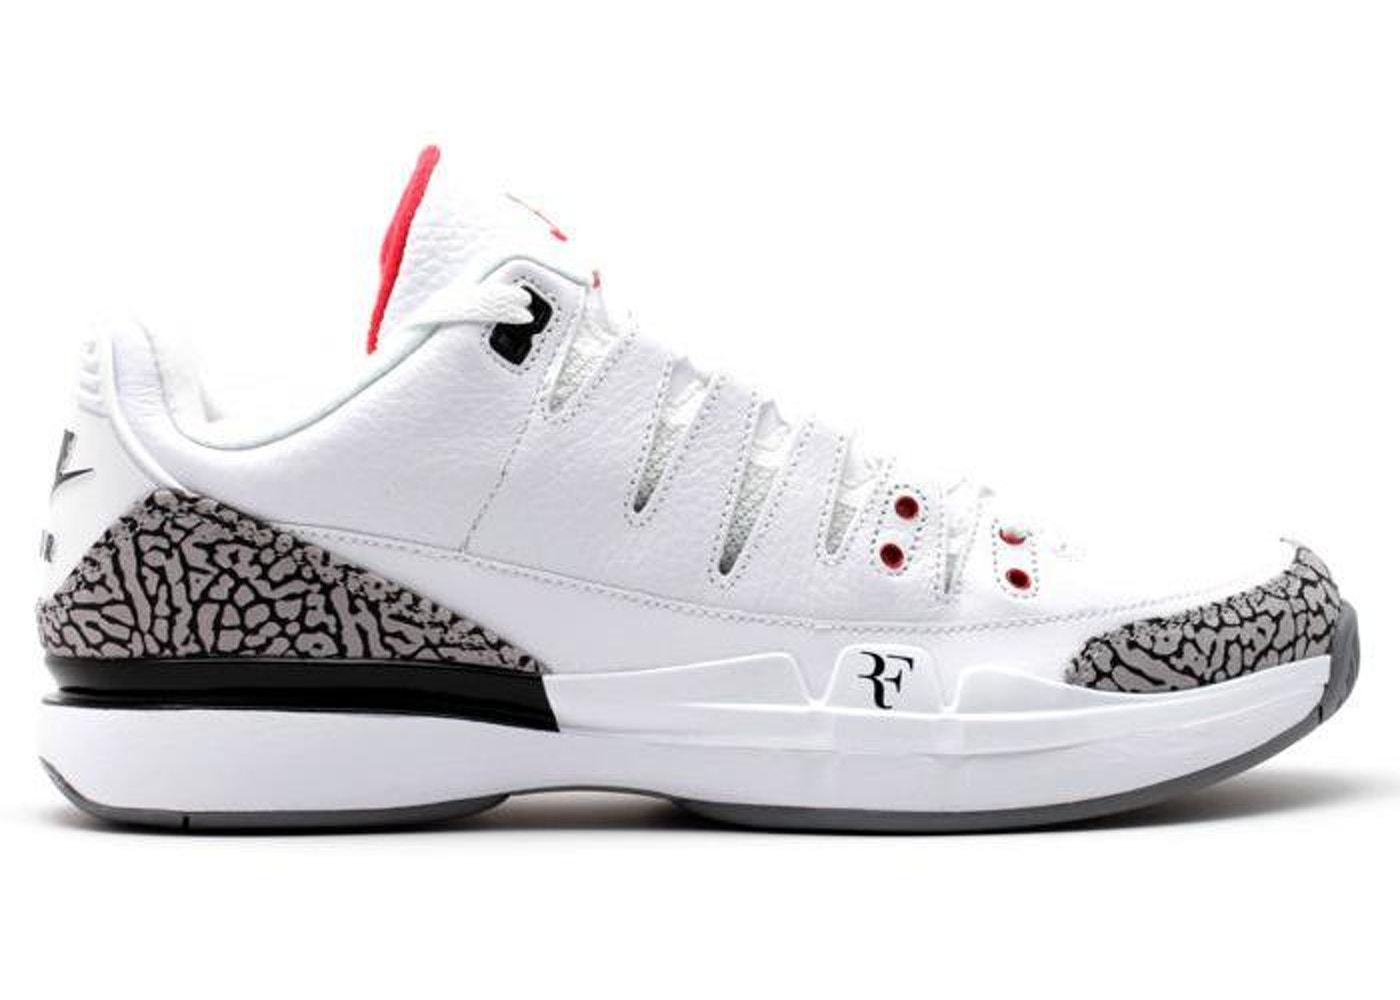 59f2a38bf866 Nike Zoom Vapor AJ3 White Cement - 709998-160